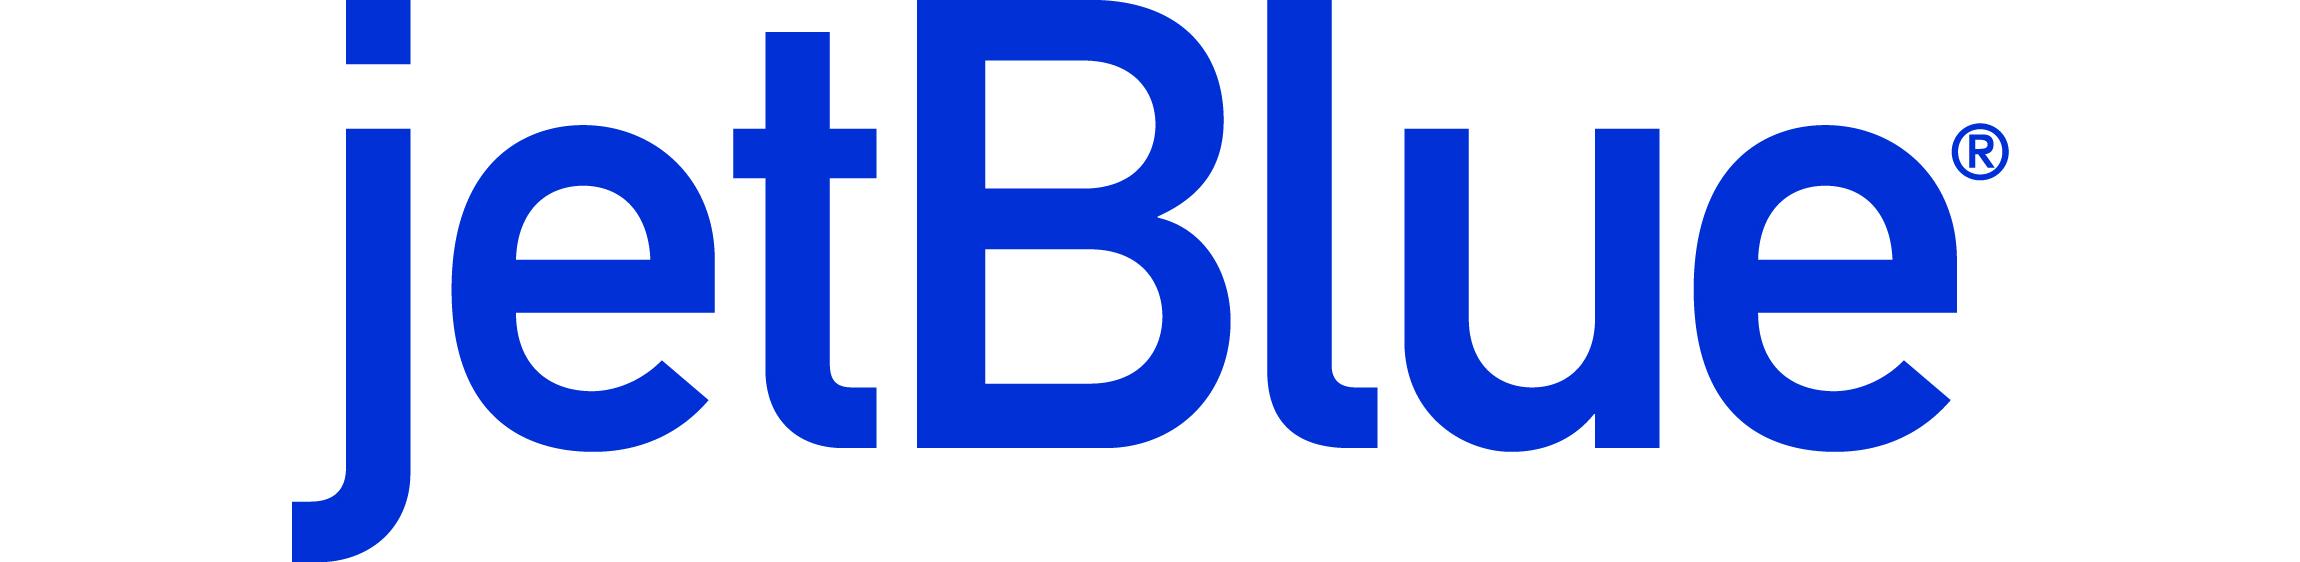 Jet Blue Logo Box.jpg